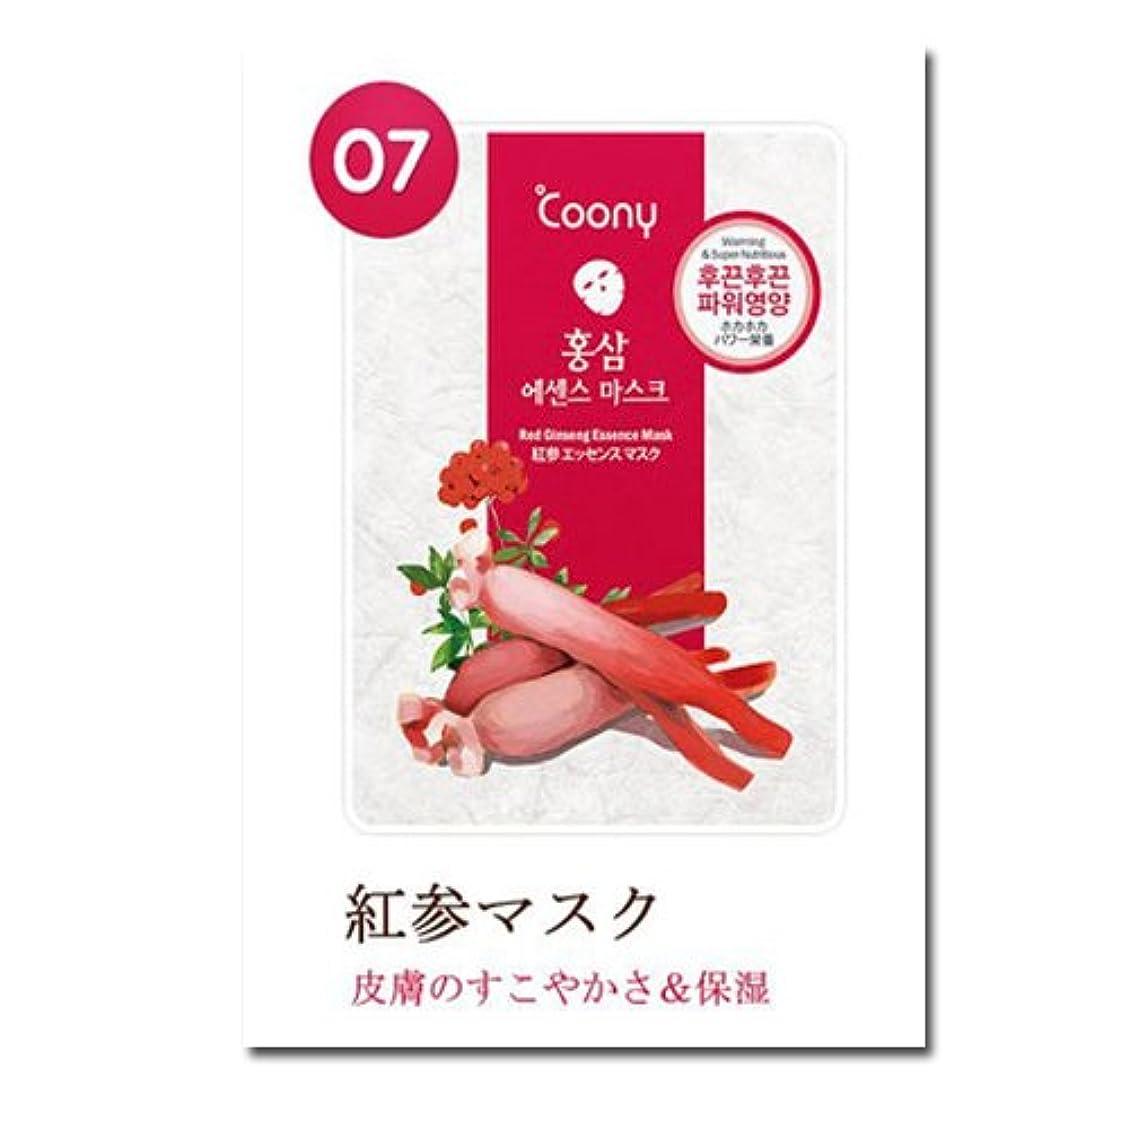 coony?韓国コスメ/潤い/乾燥肌/エッセンスマスクパック/紅参マスクパック10枚//びっくり品質